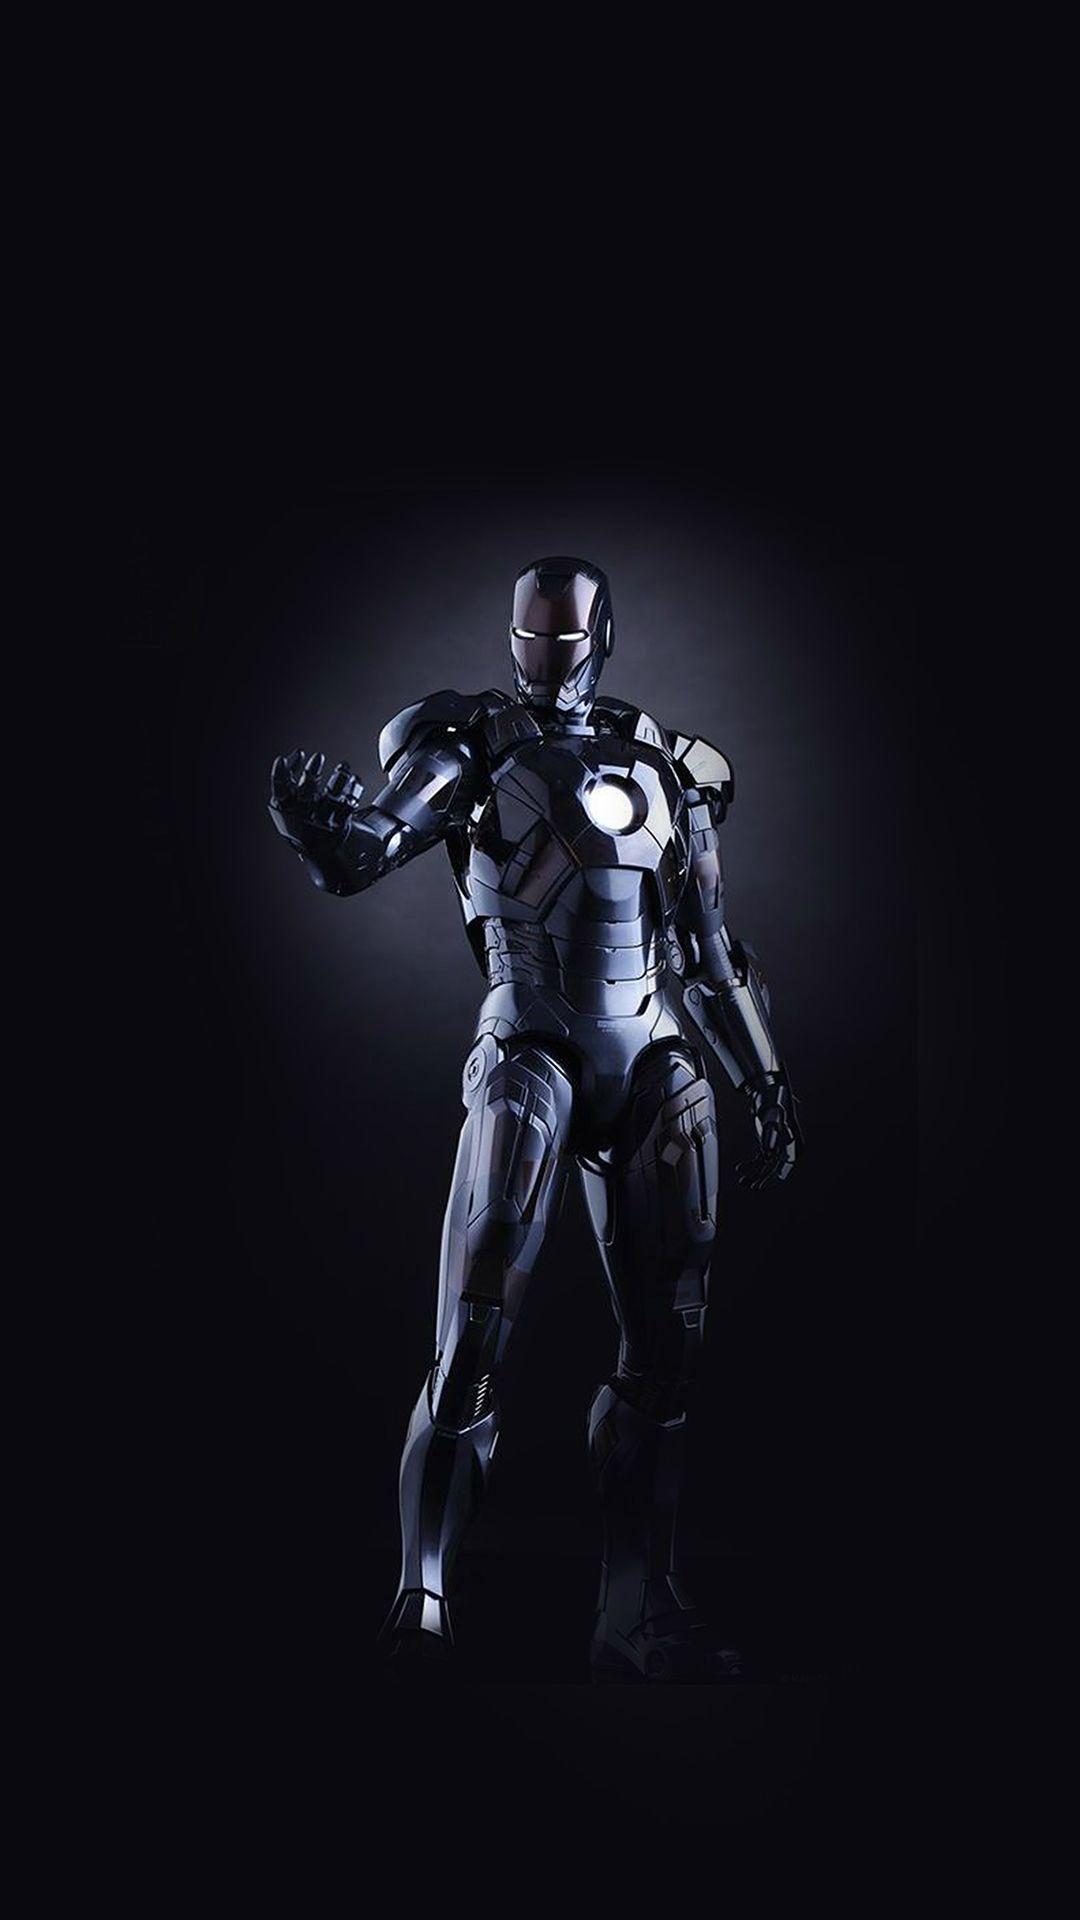 Wallpaper iphone avengers - Ironman Dark Figure Hero Art Avengers Iphone 7 Wallpaper